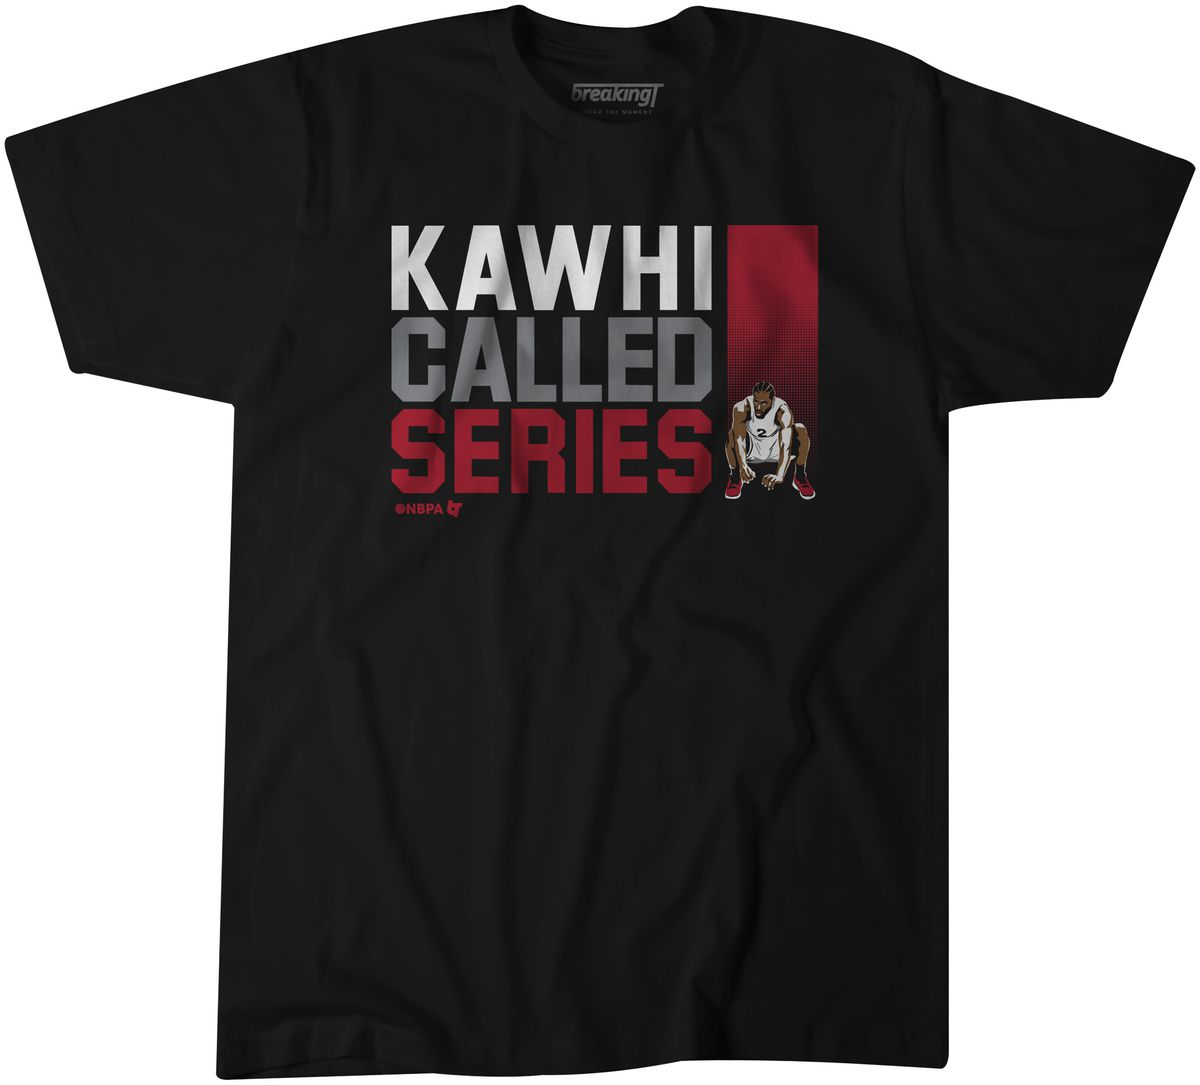 2019 NBA Playoffs With Kawhi Leonard: The Shot. The Bounce